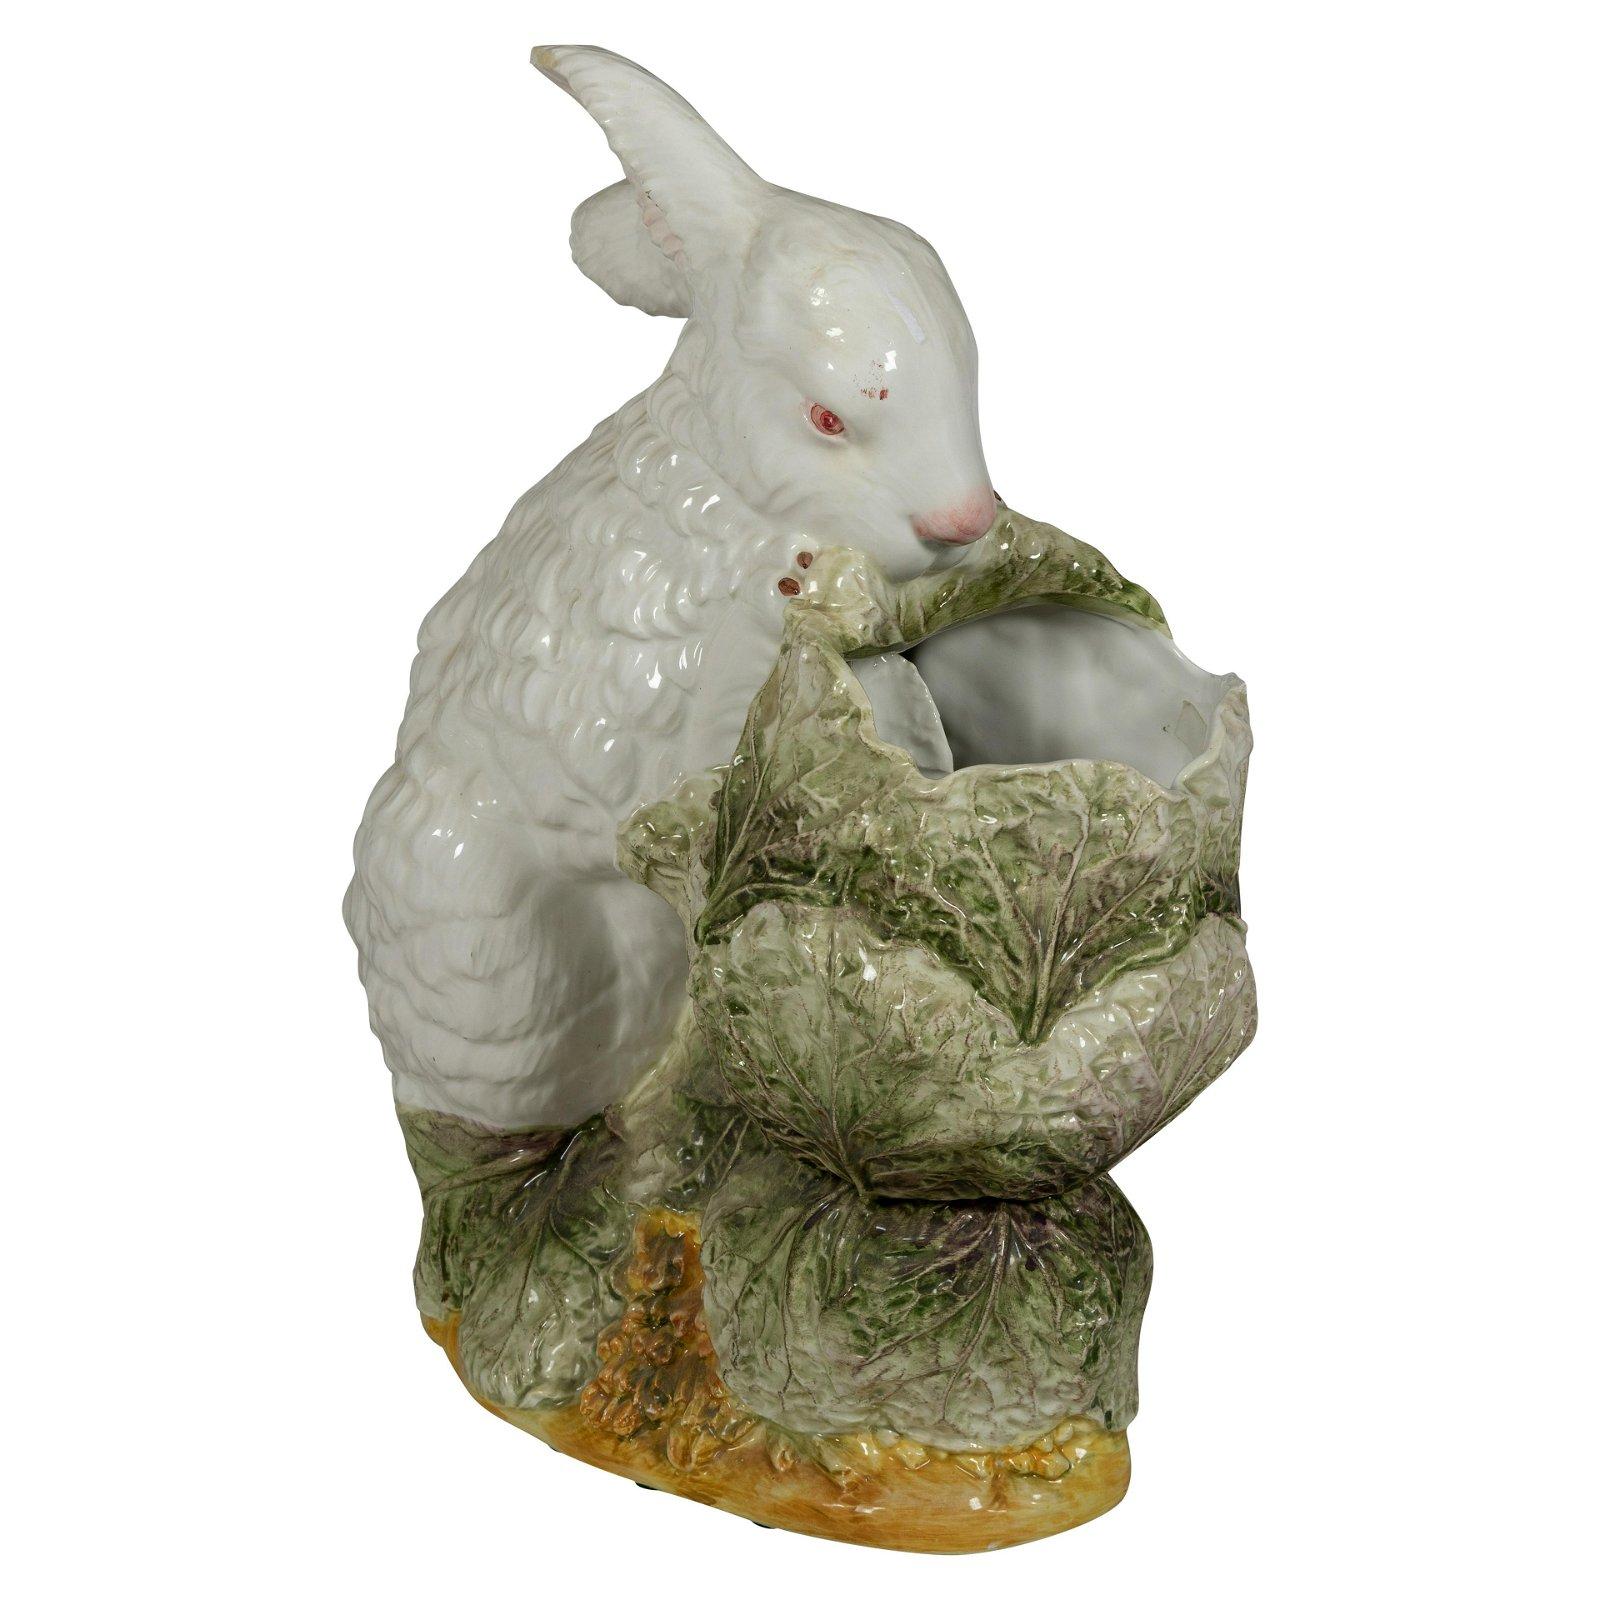 Italian Majolica Rabbit Planter